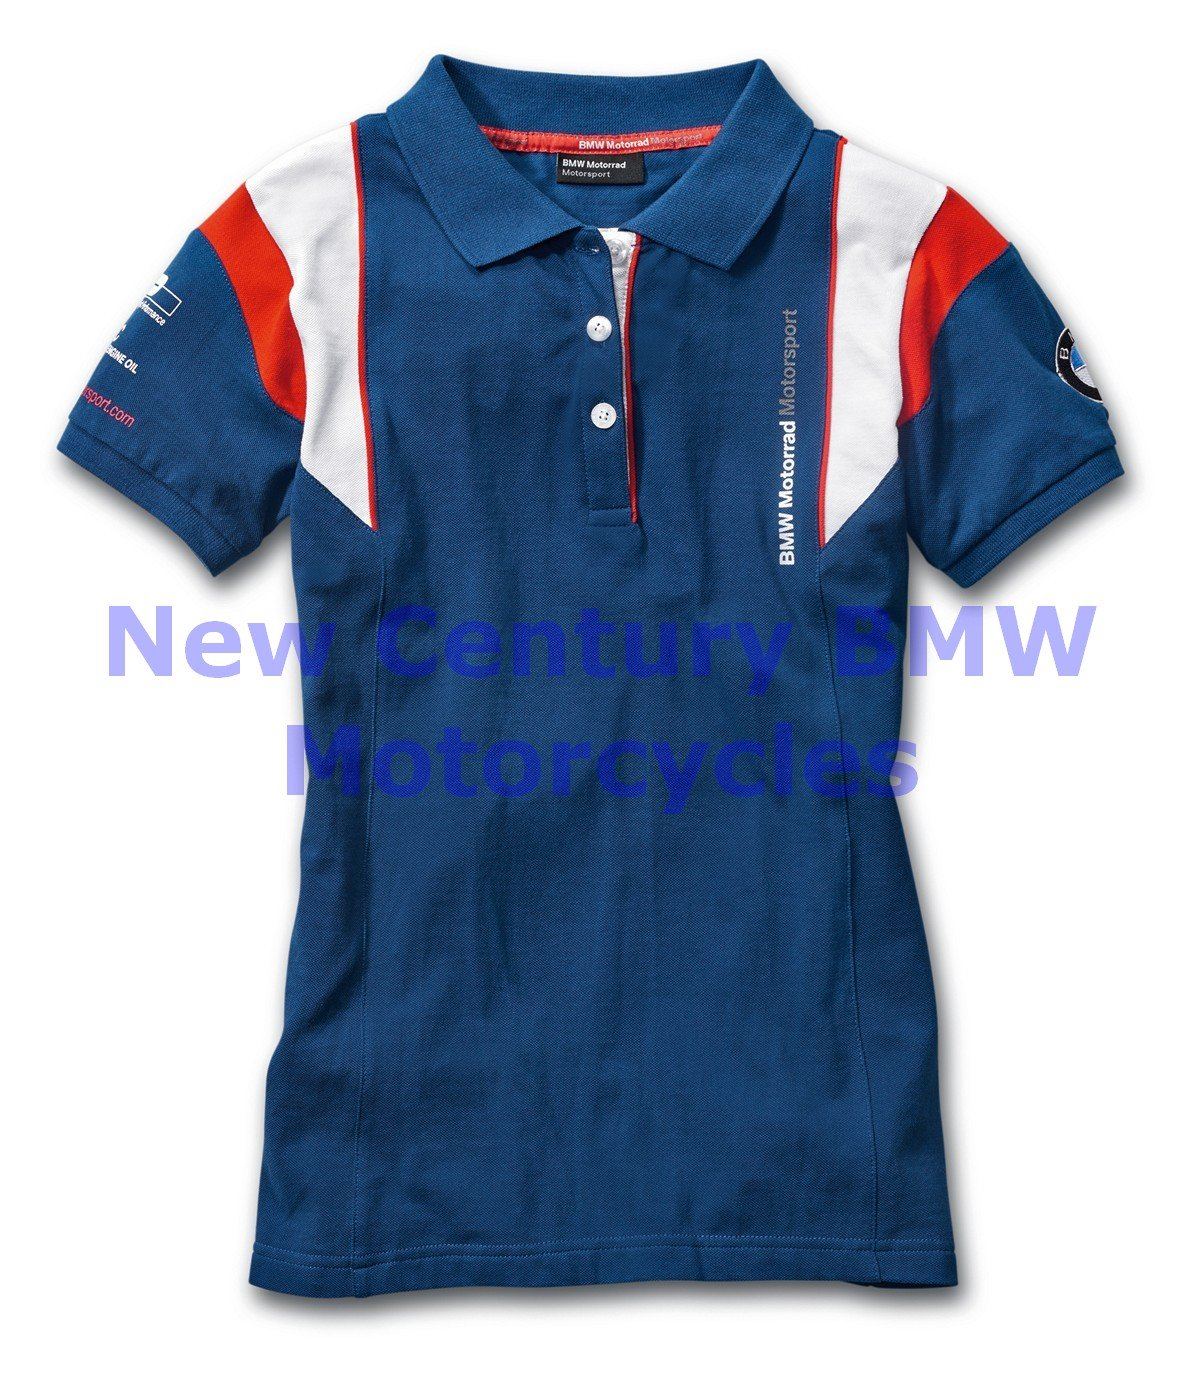 BMW Genuine Motorcycle Women Motorsport Poloshirt Blue/White/Red L Large